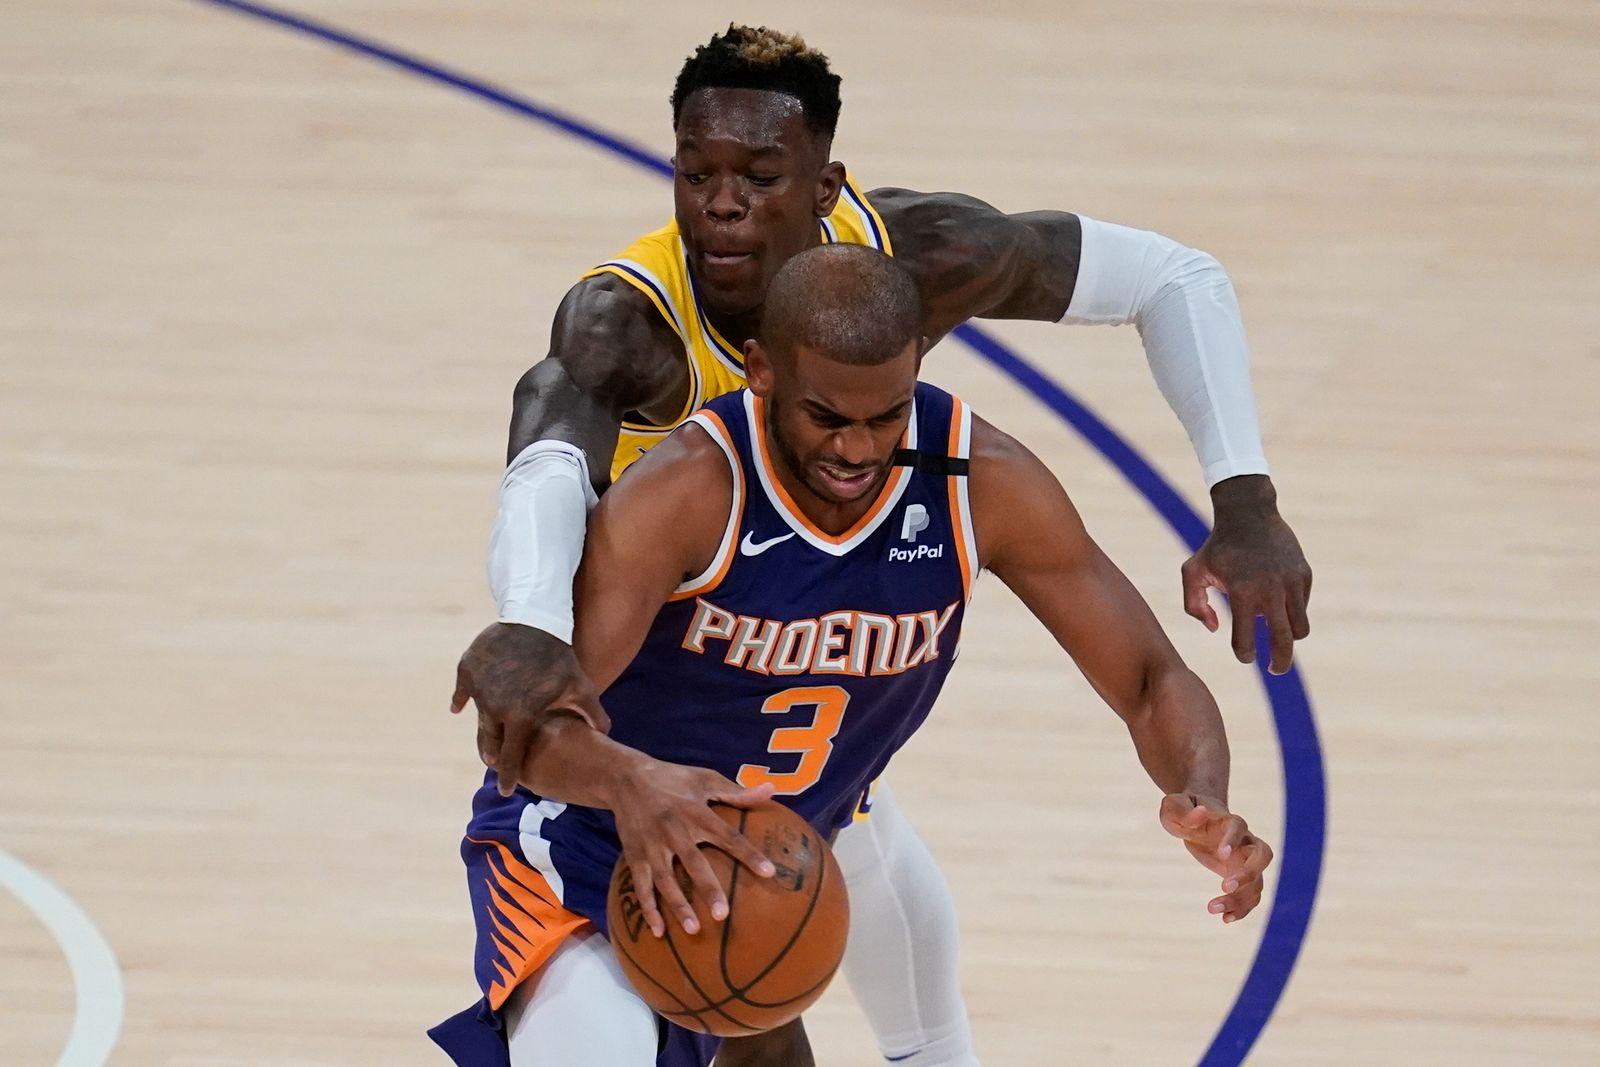 Los Angeles Lakers - Phoenix Suns